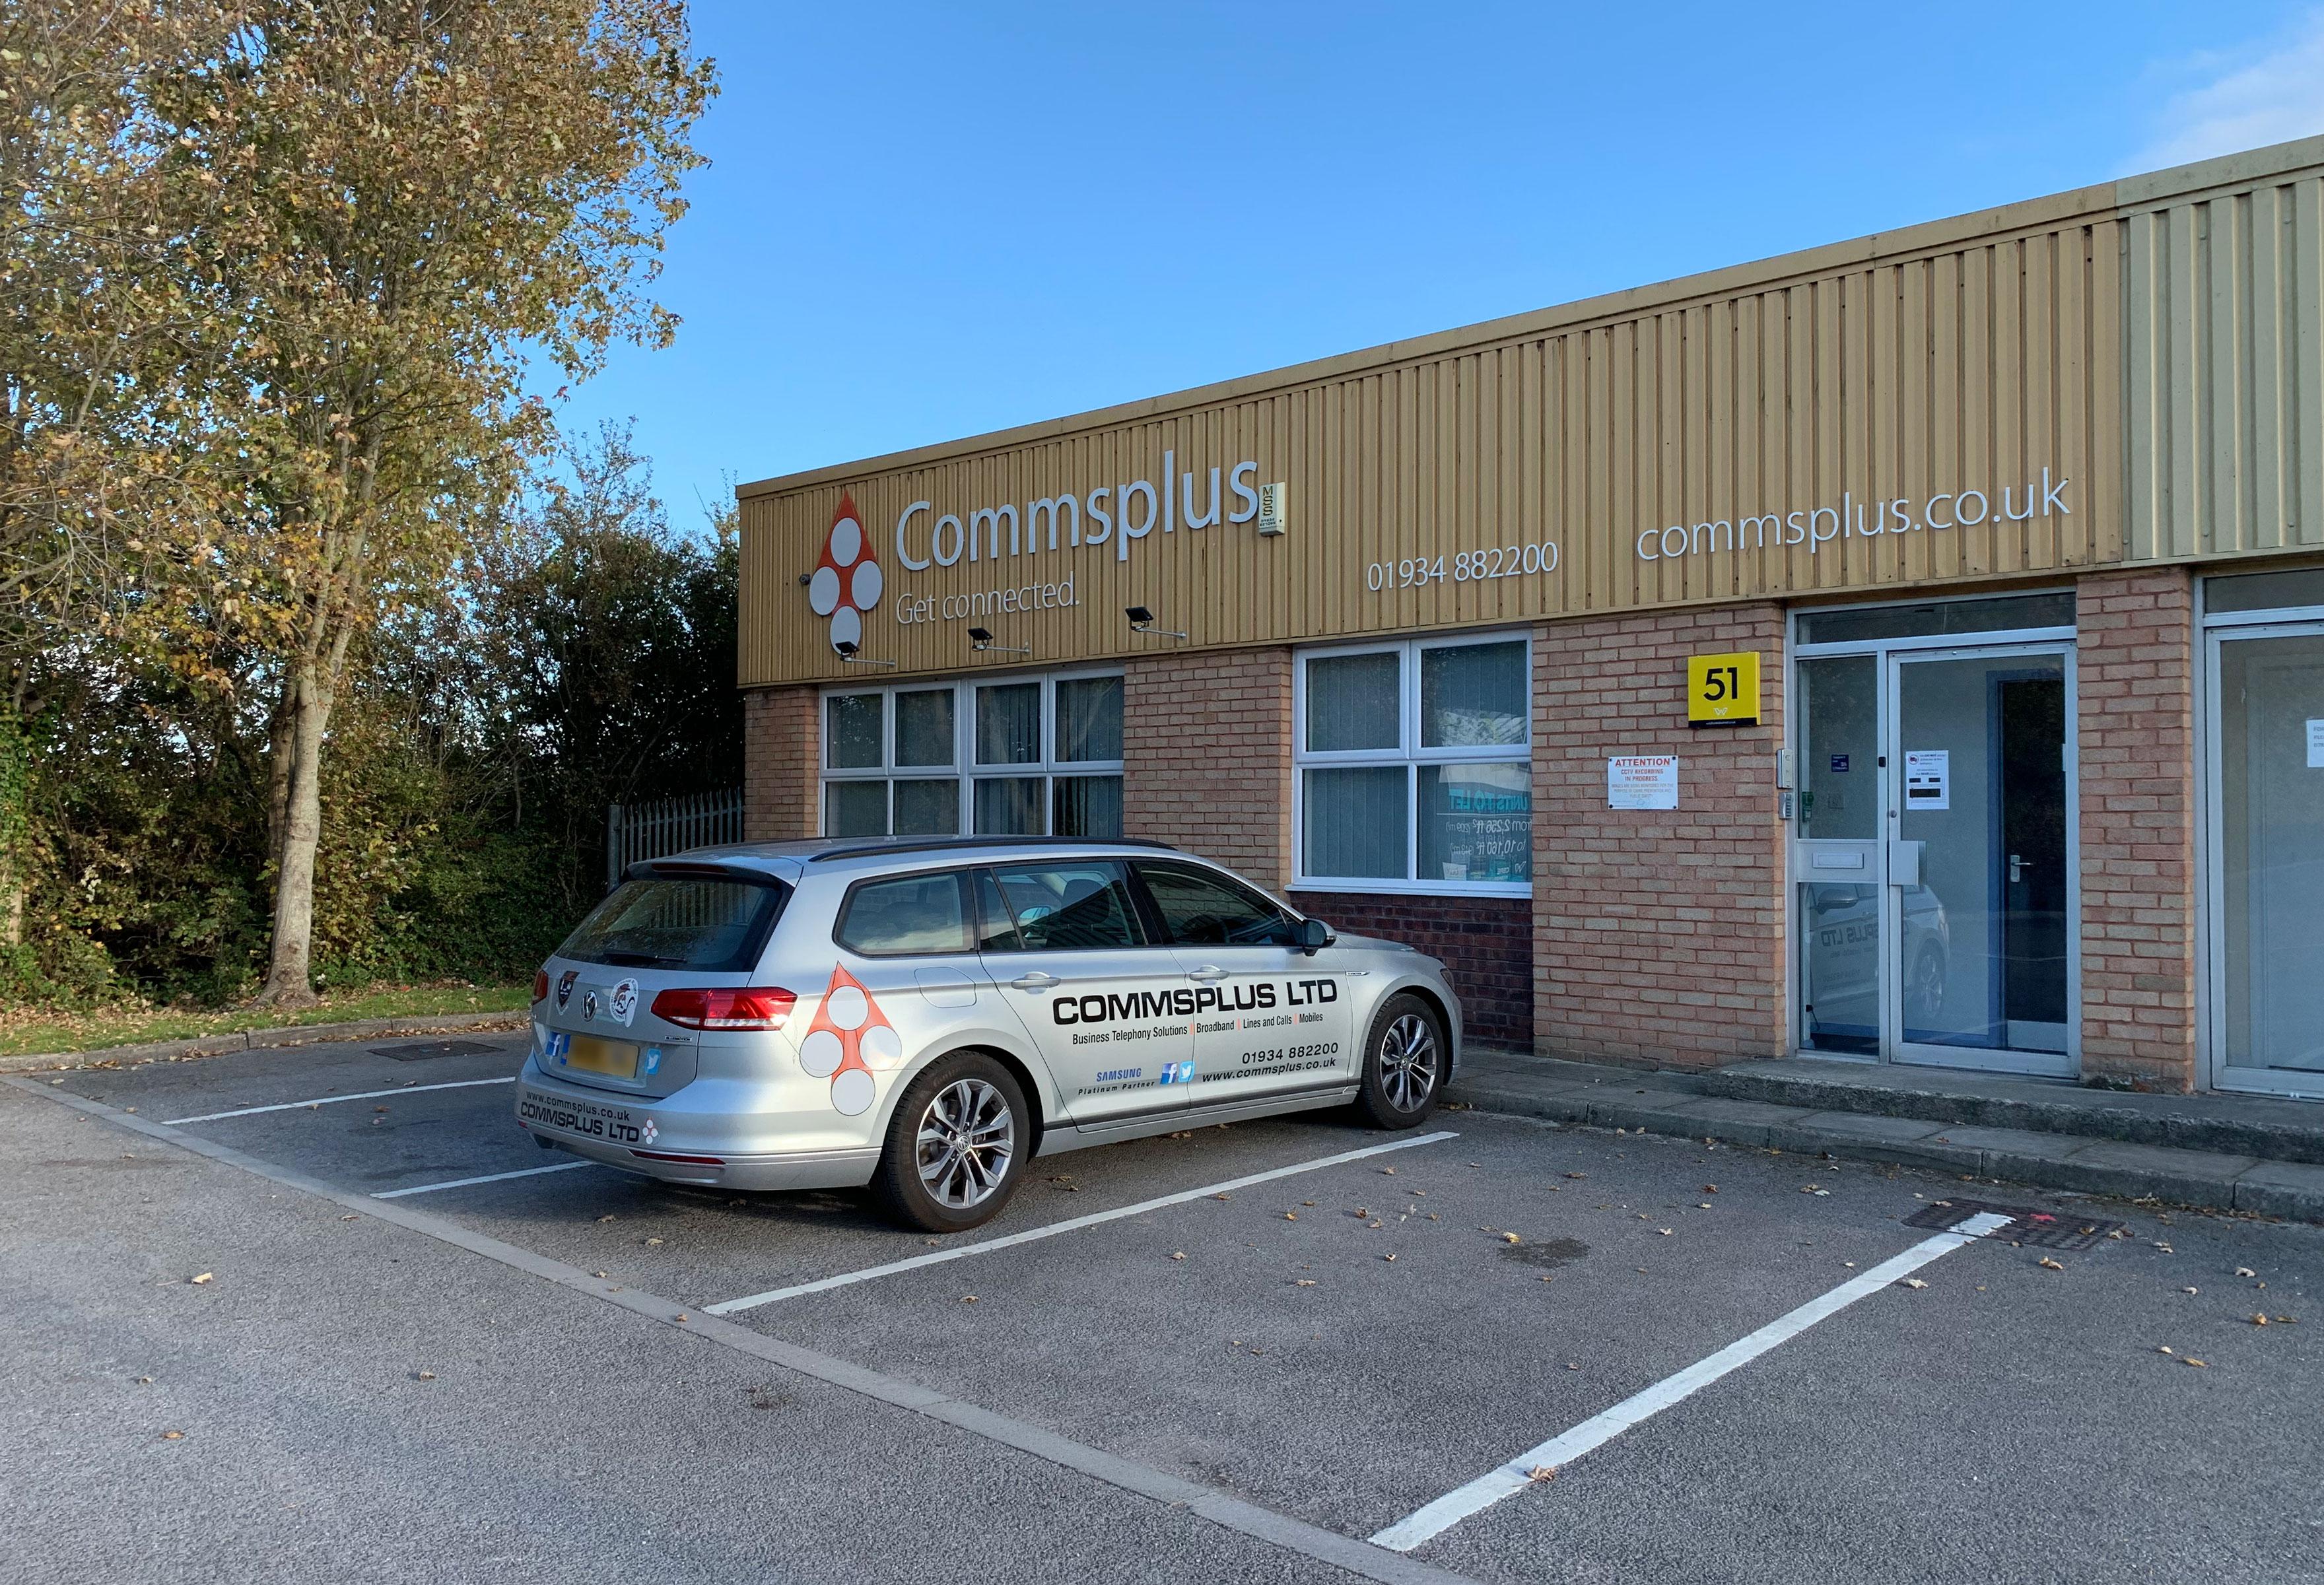 Commsplus office in Weston super Mare